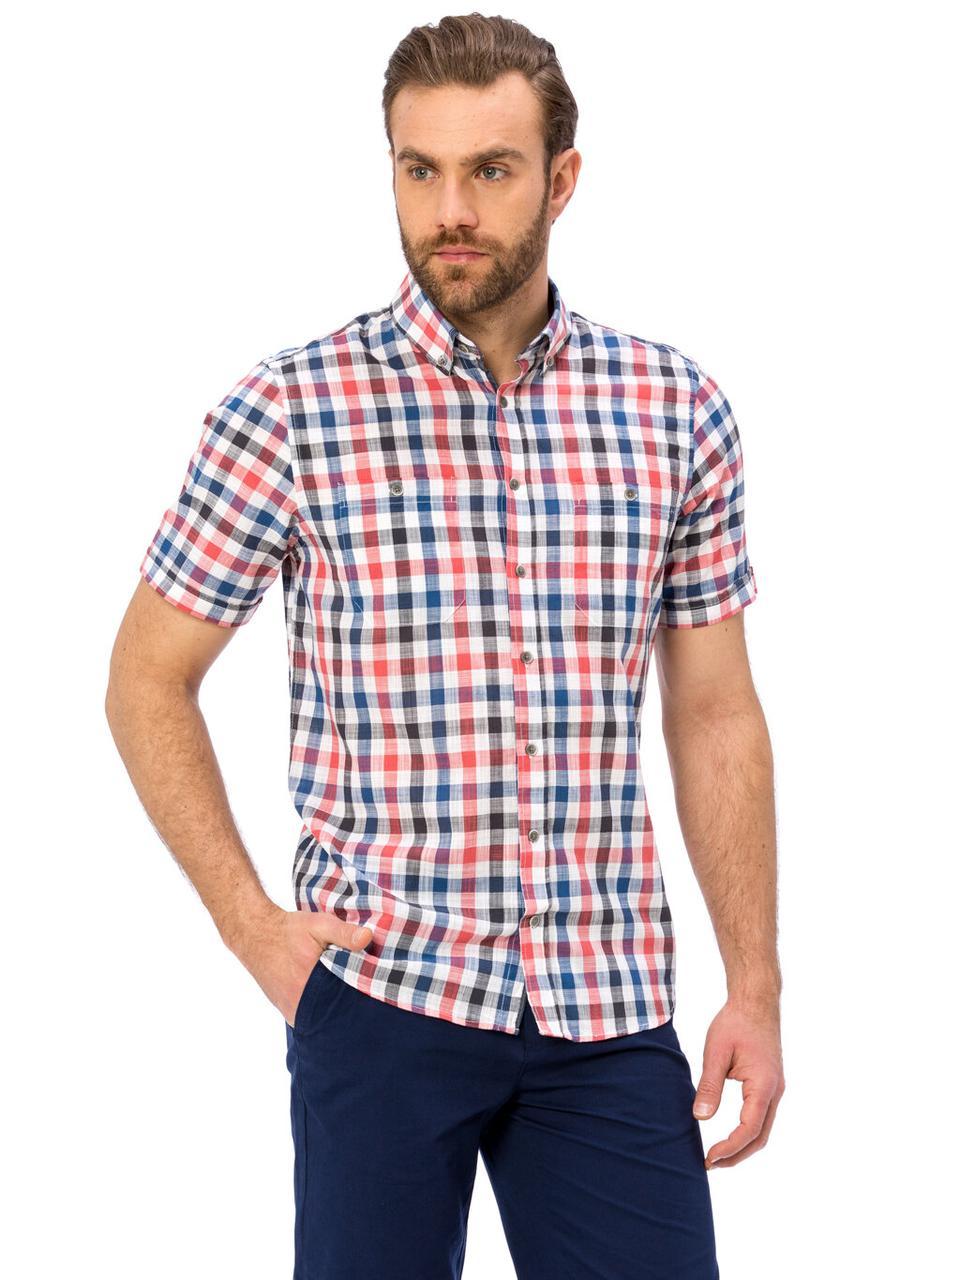 Белая мужская рубашка LC Waikiki / ЛС Вайкики в красно-синюю клетку, с карманом на груди